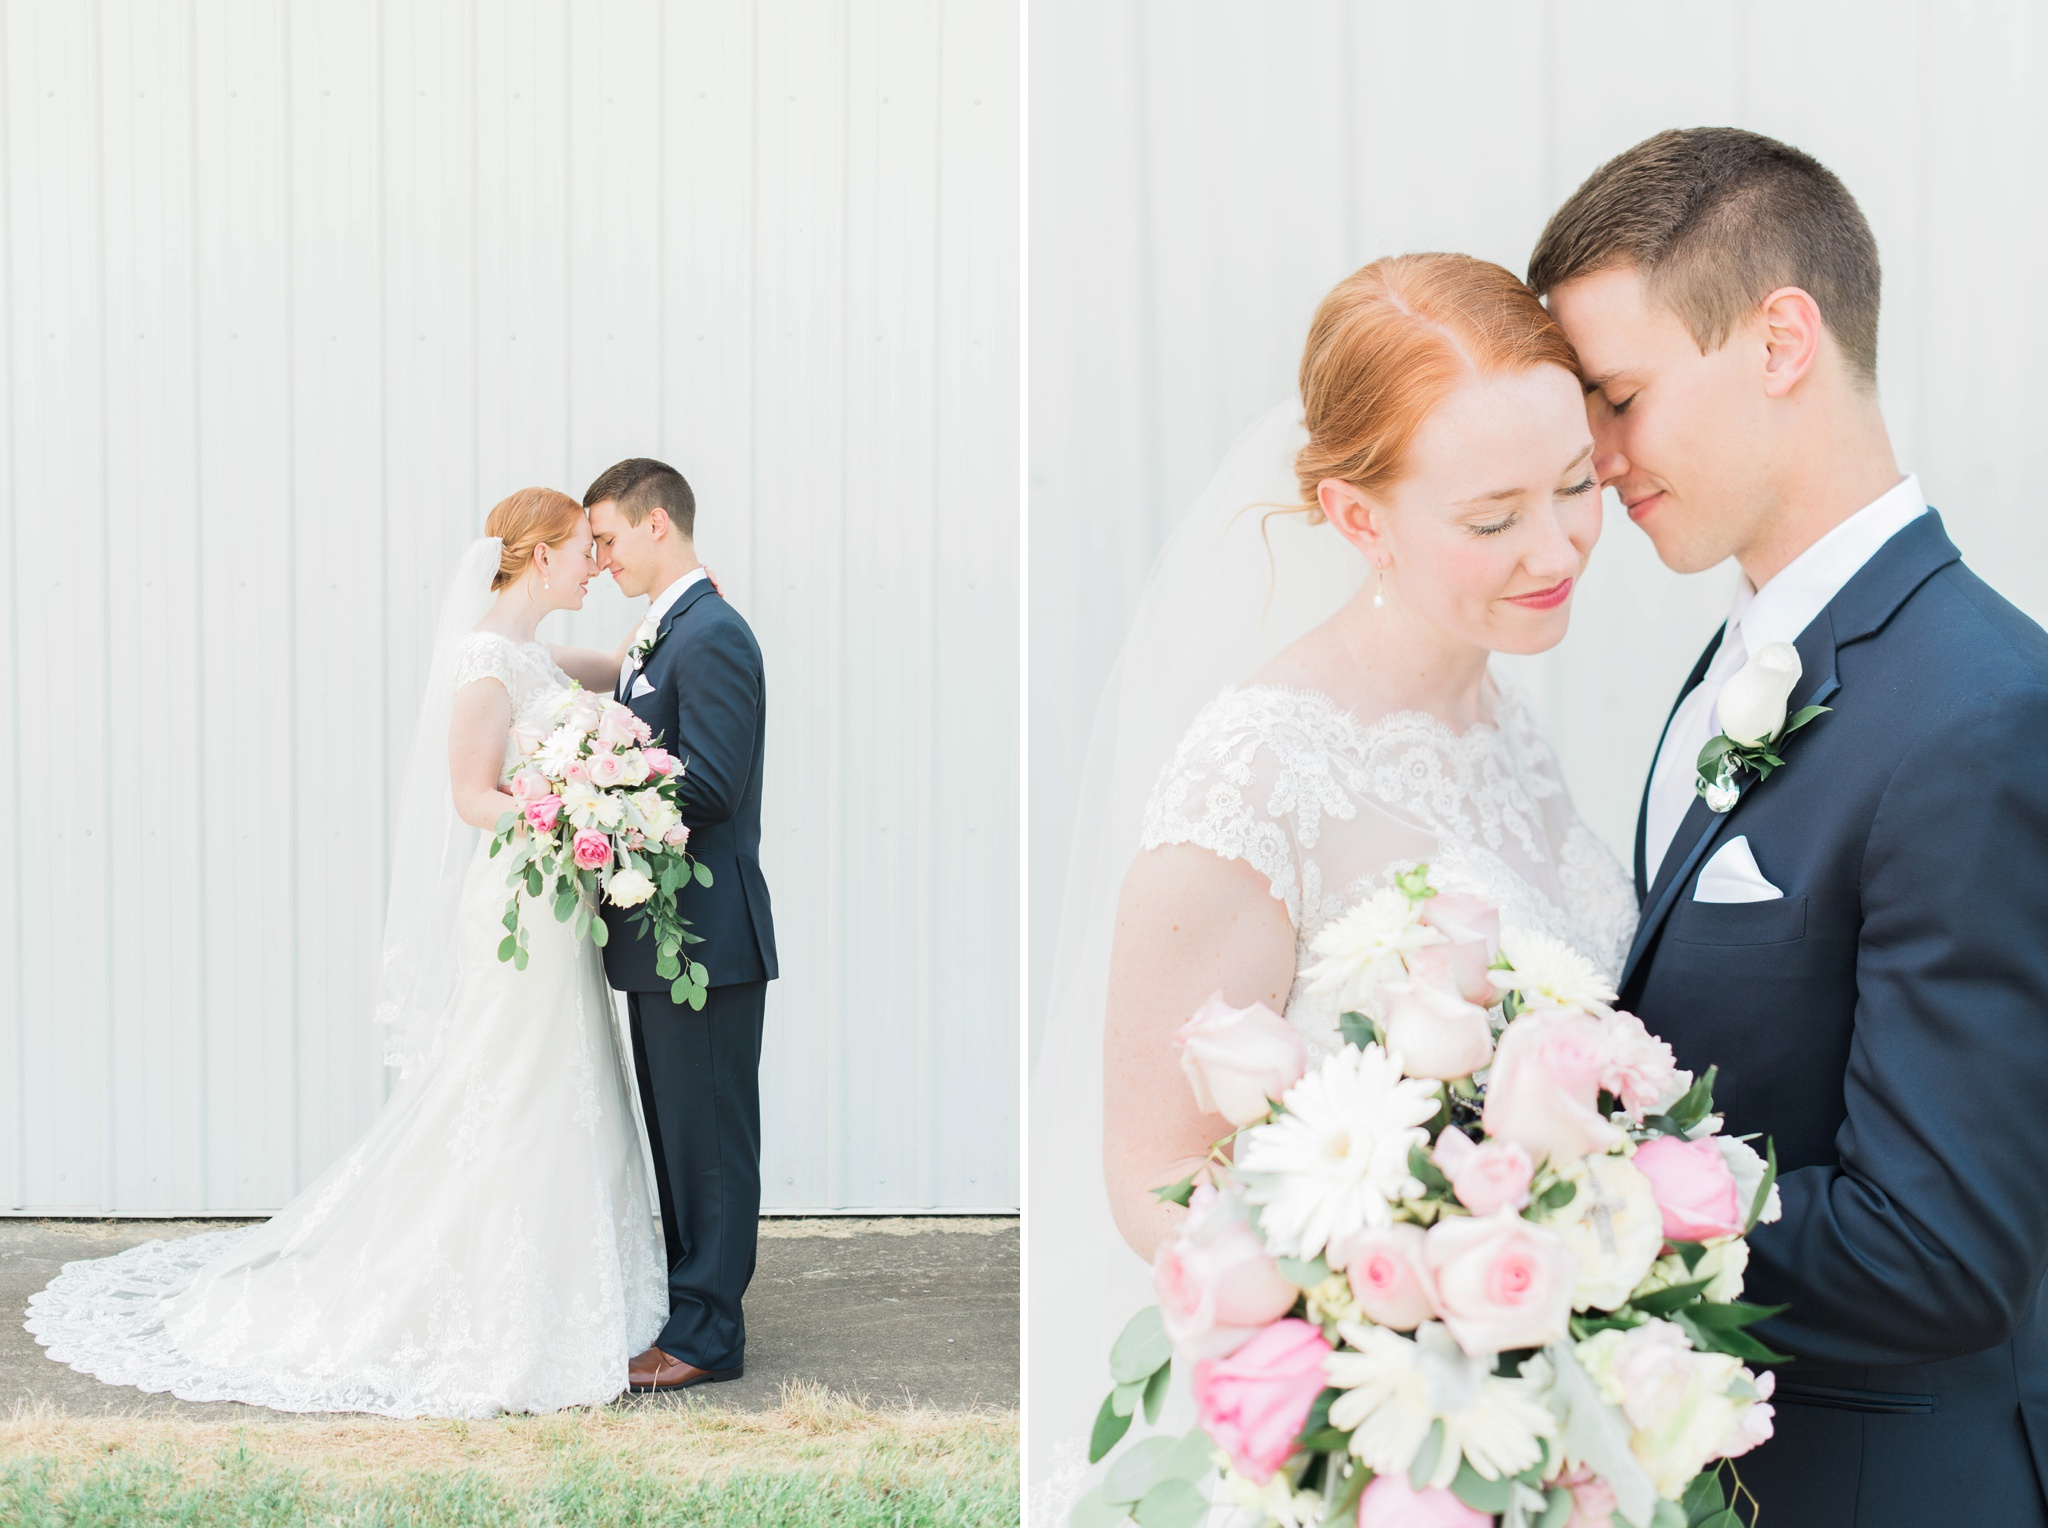 sunbury-ohio-wedding-hannah-johnathan_0099.jpg